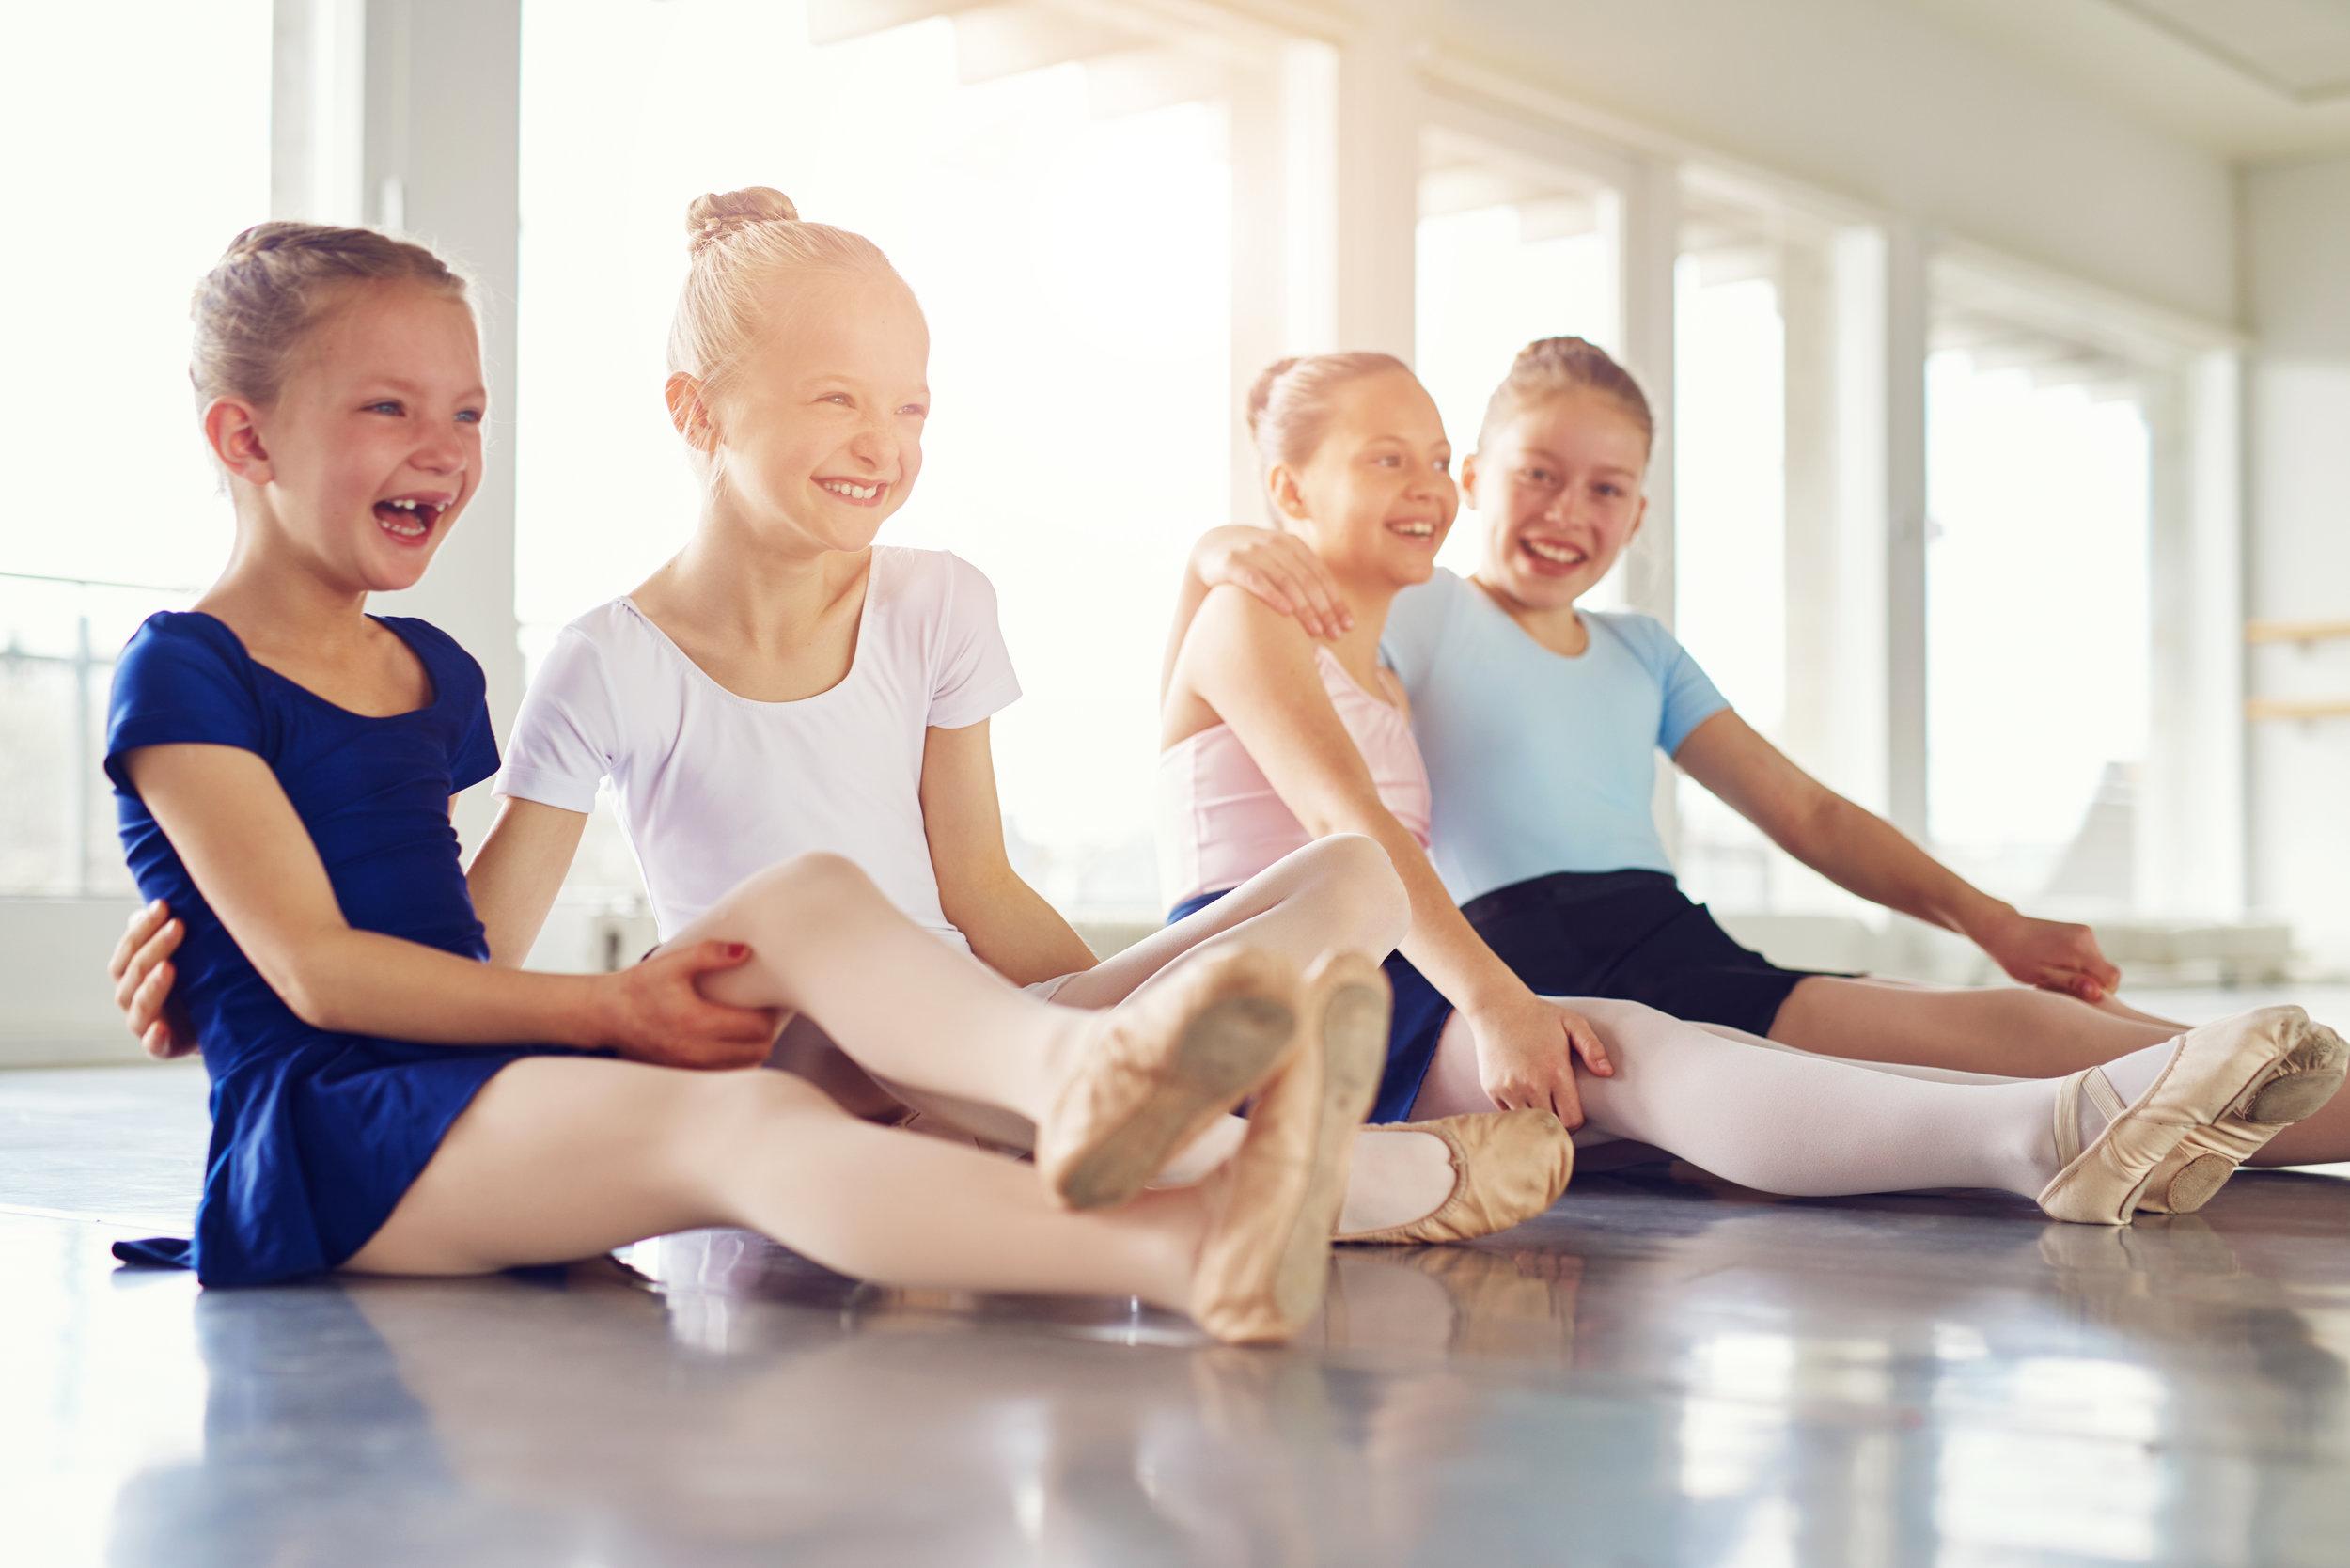 2017.04.11_-_Ballet_Children17973.jpg